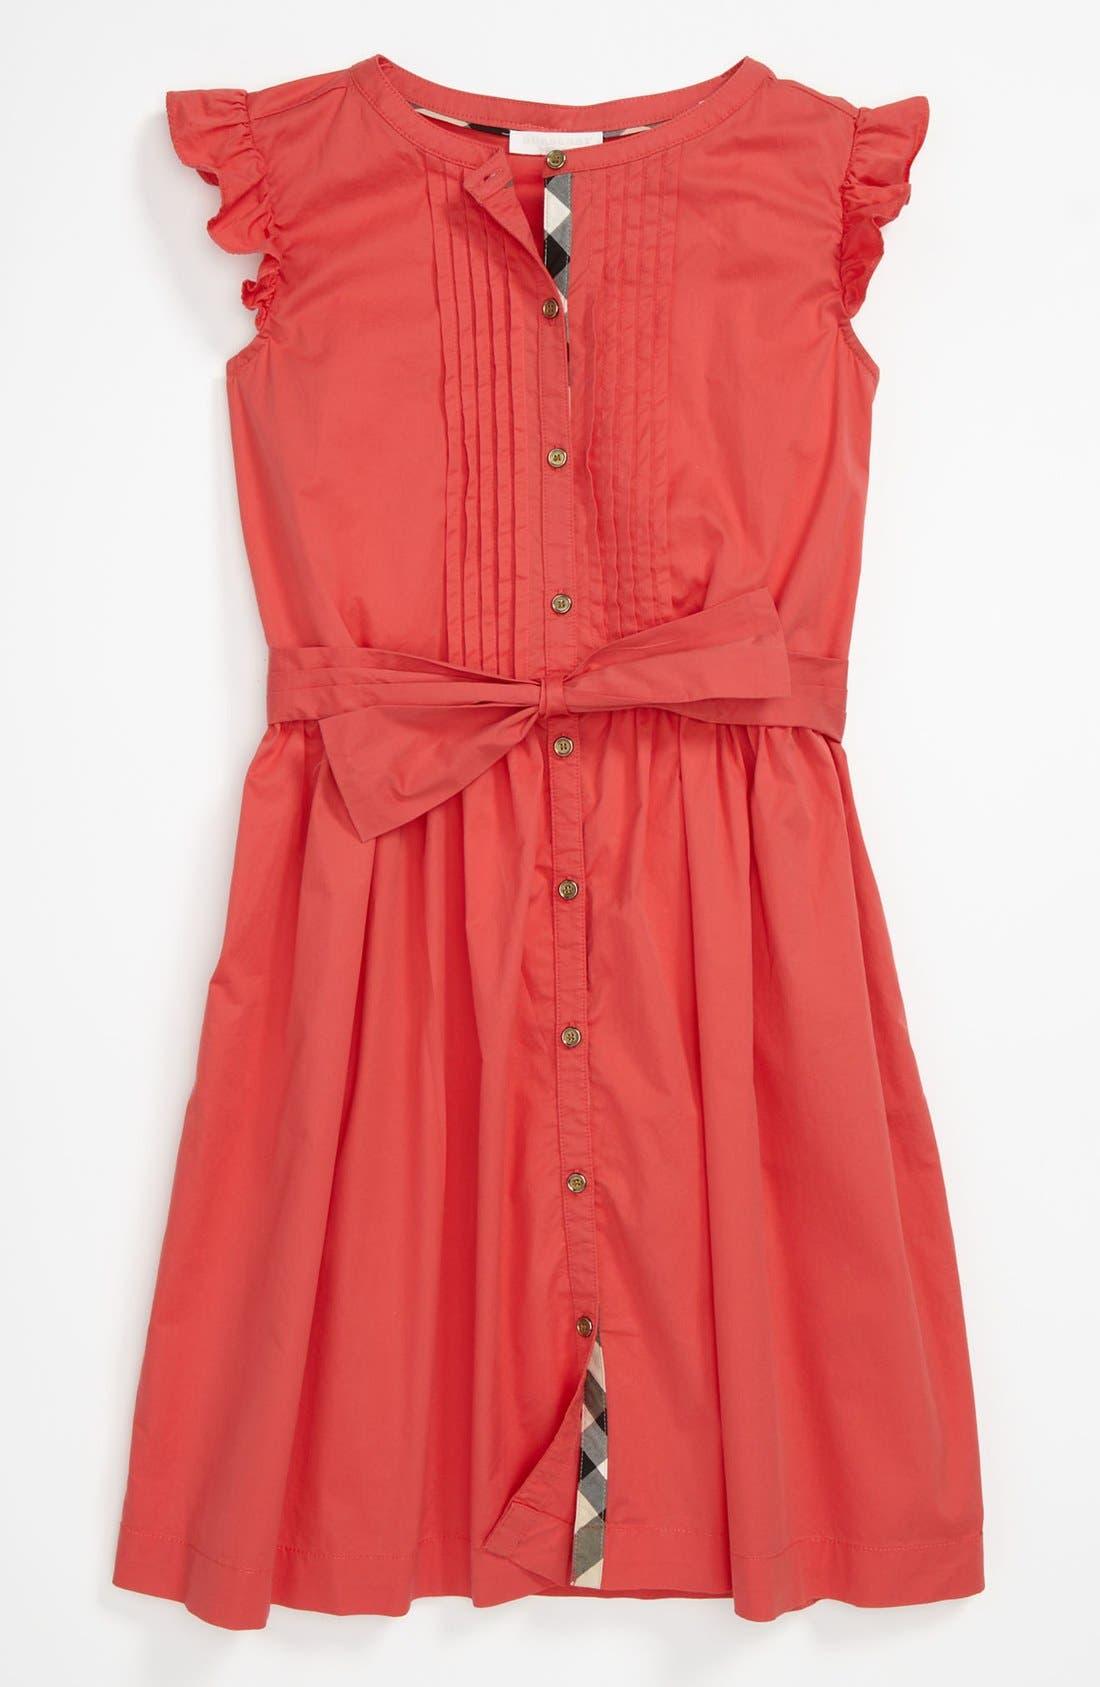 Main Image - Burberry 'Estella' Dress (Little Girls & Big Girls)